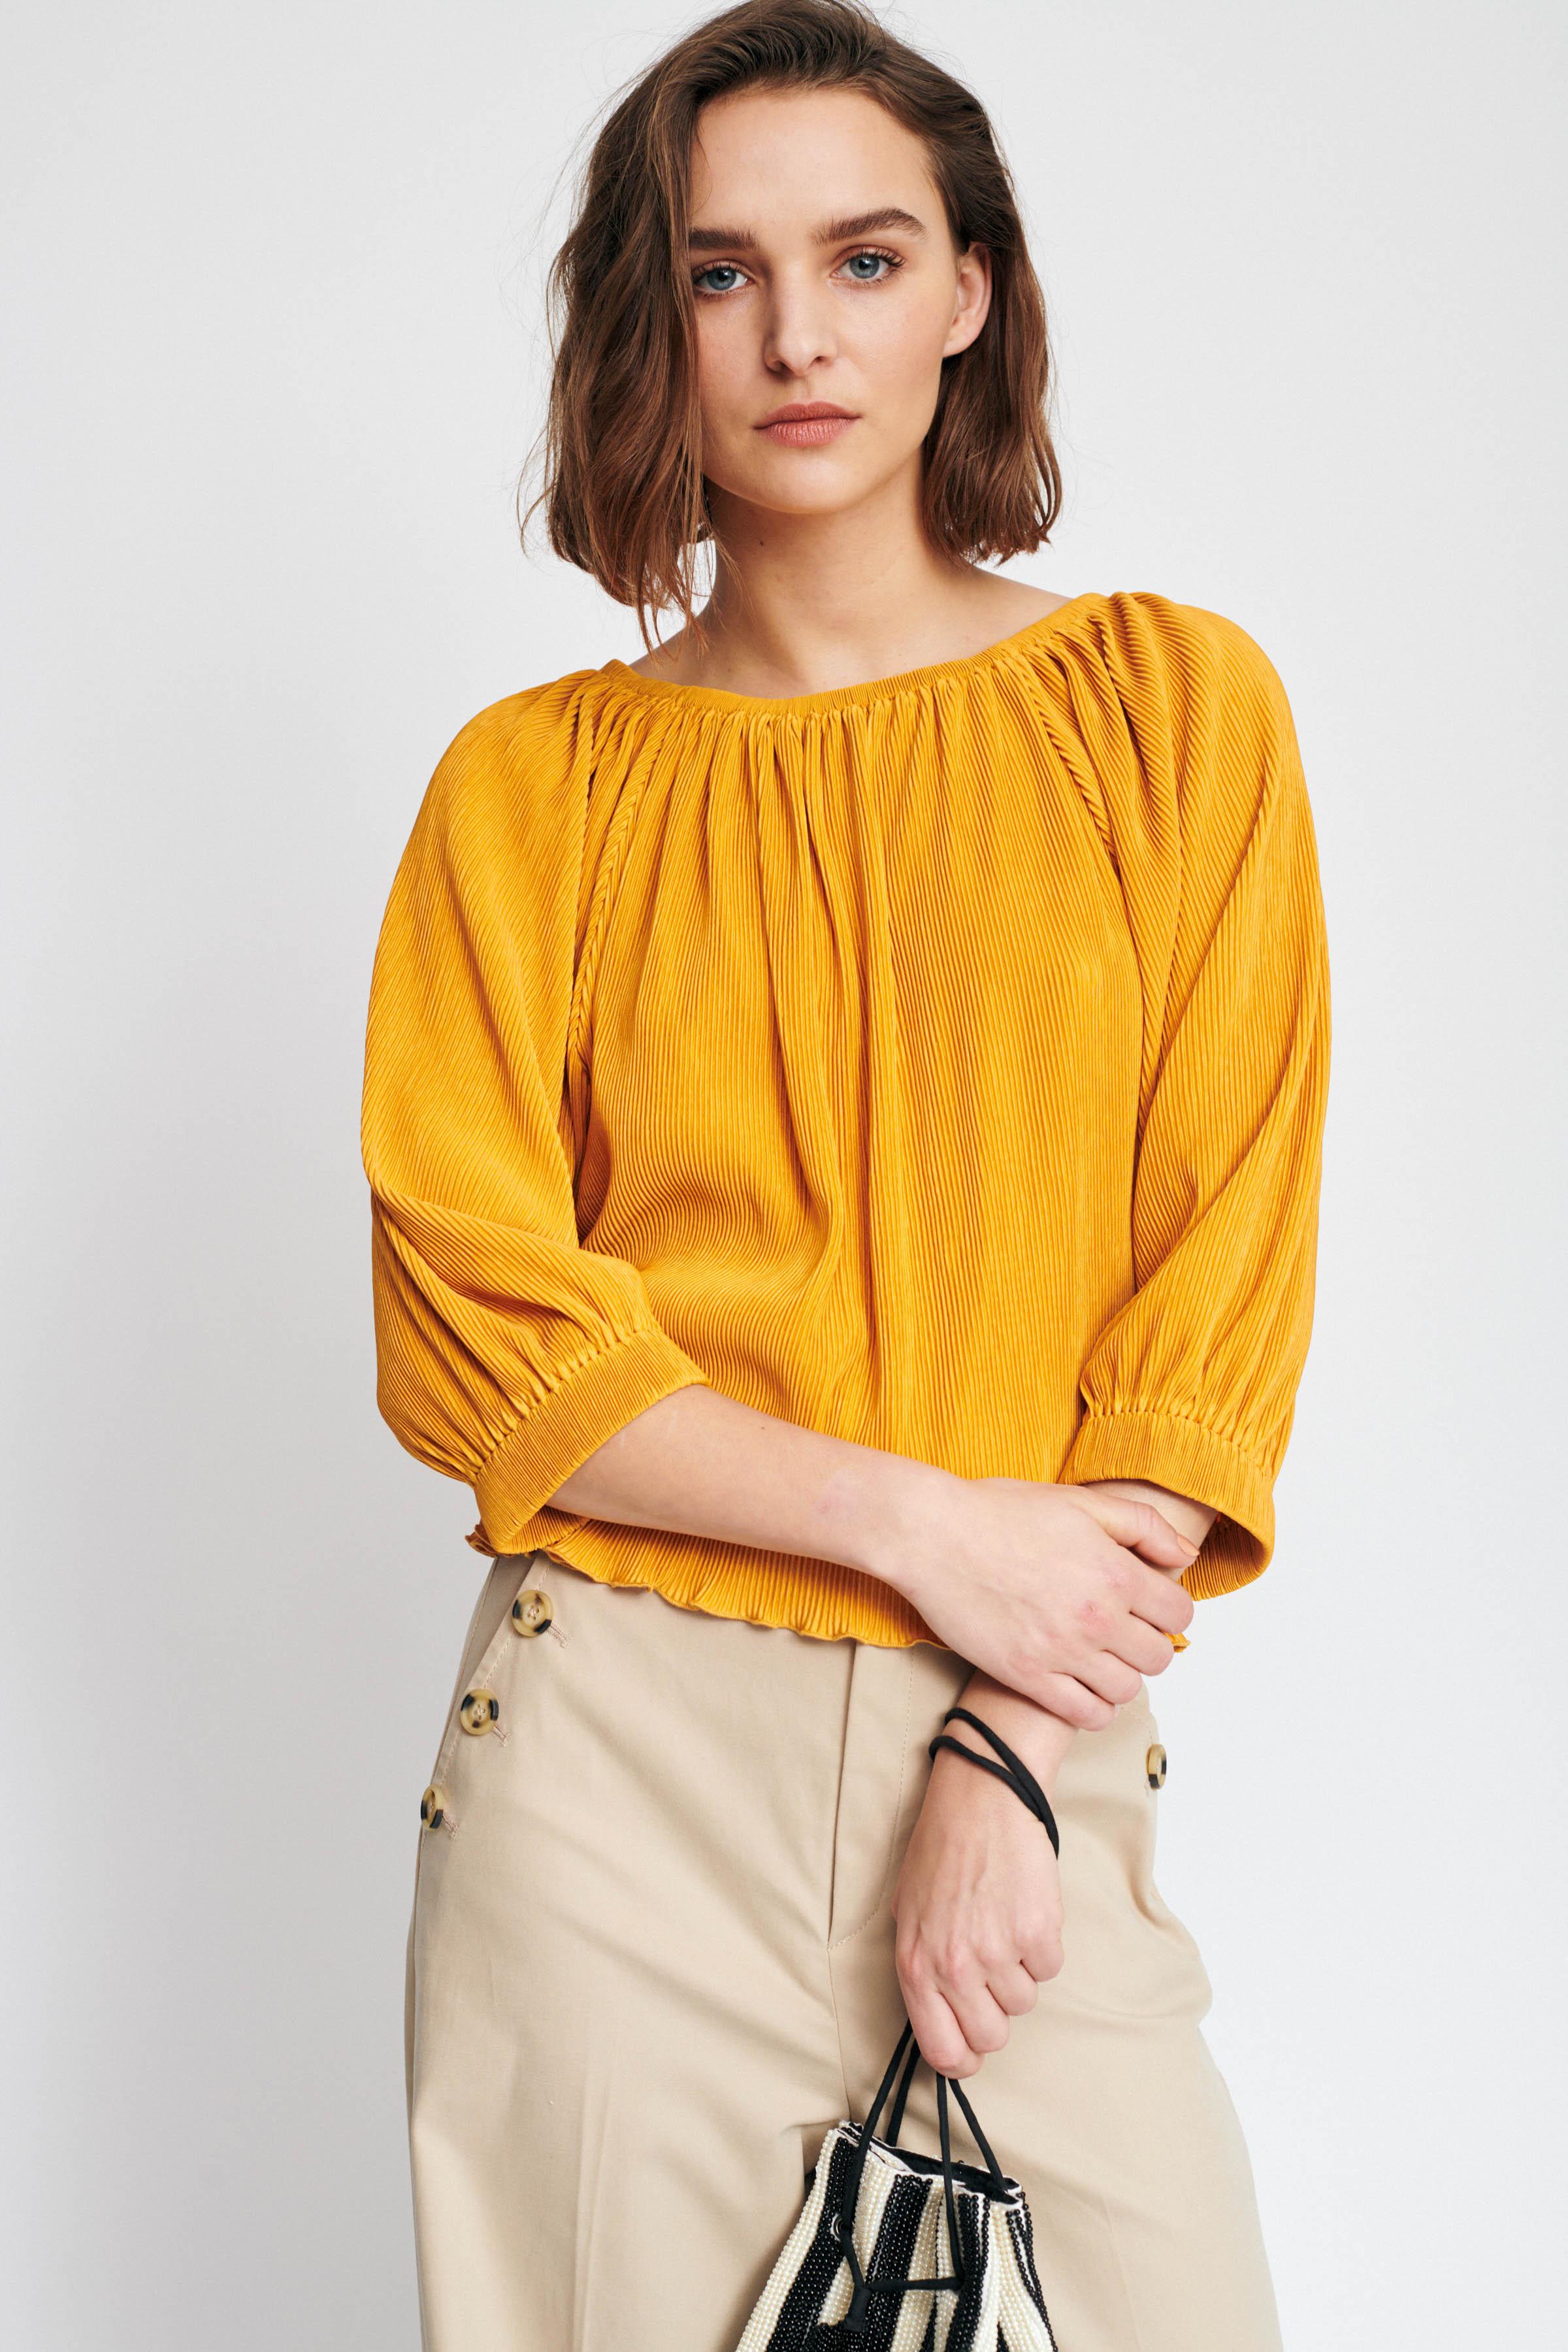 Sunny Yellow Langærmet T-shirt – Køb Sunny Yellow Langærmet T-shirt fra str. XXS-XL her